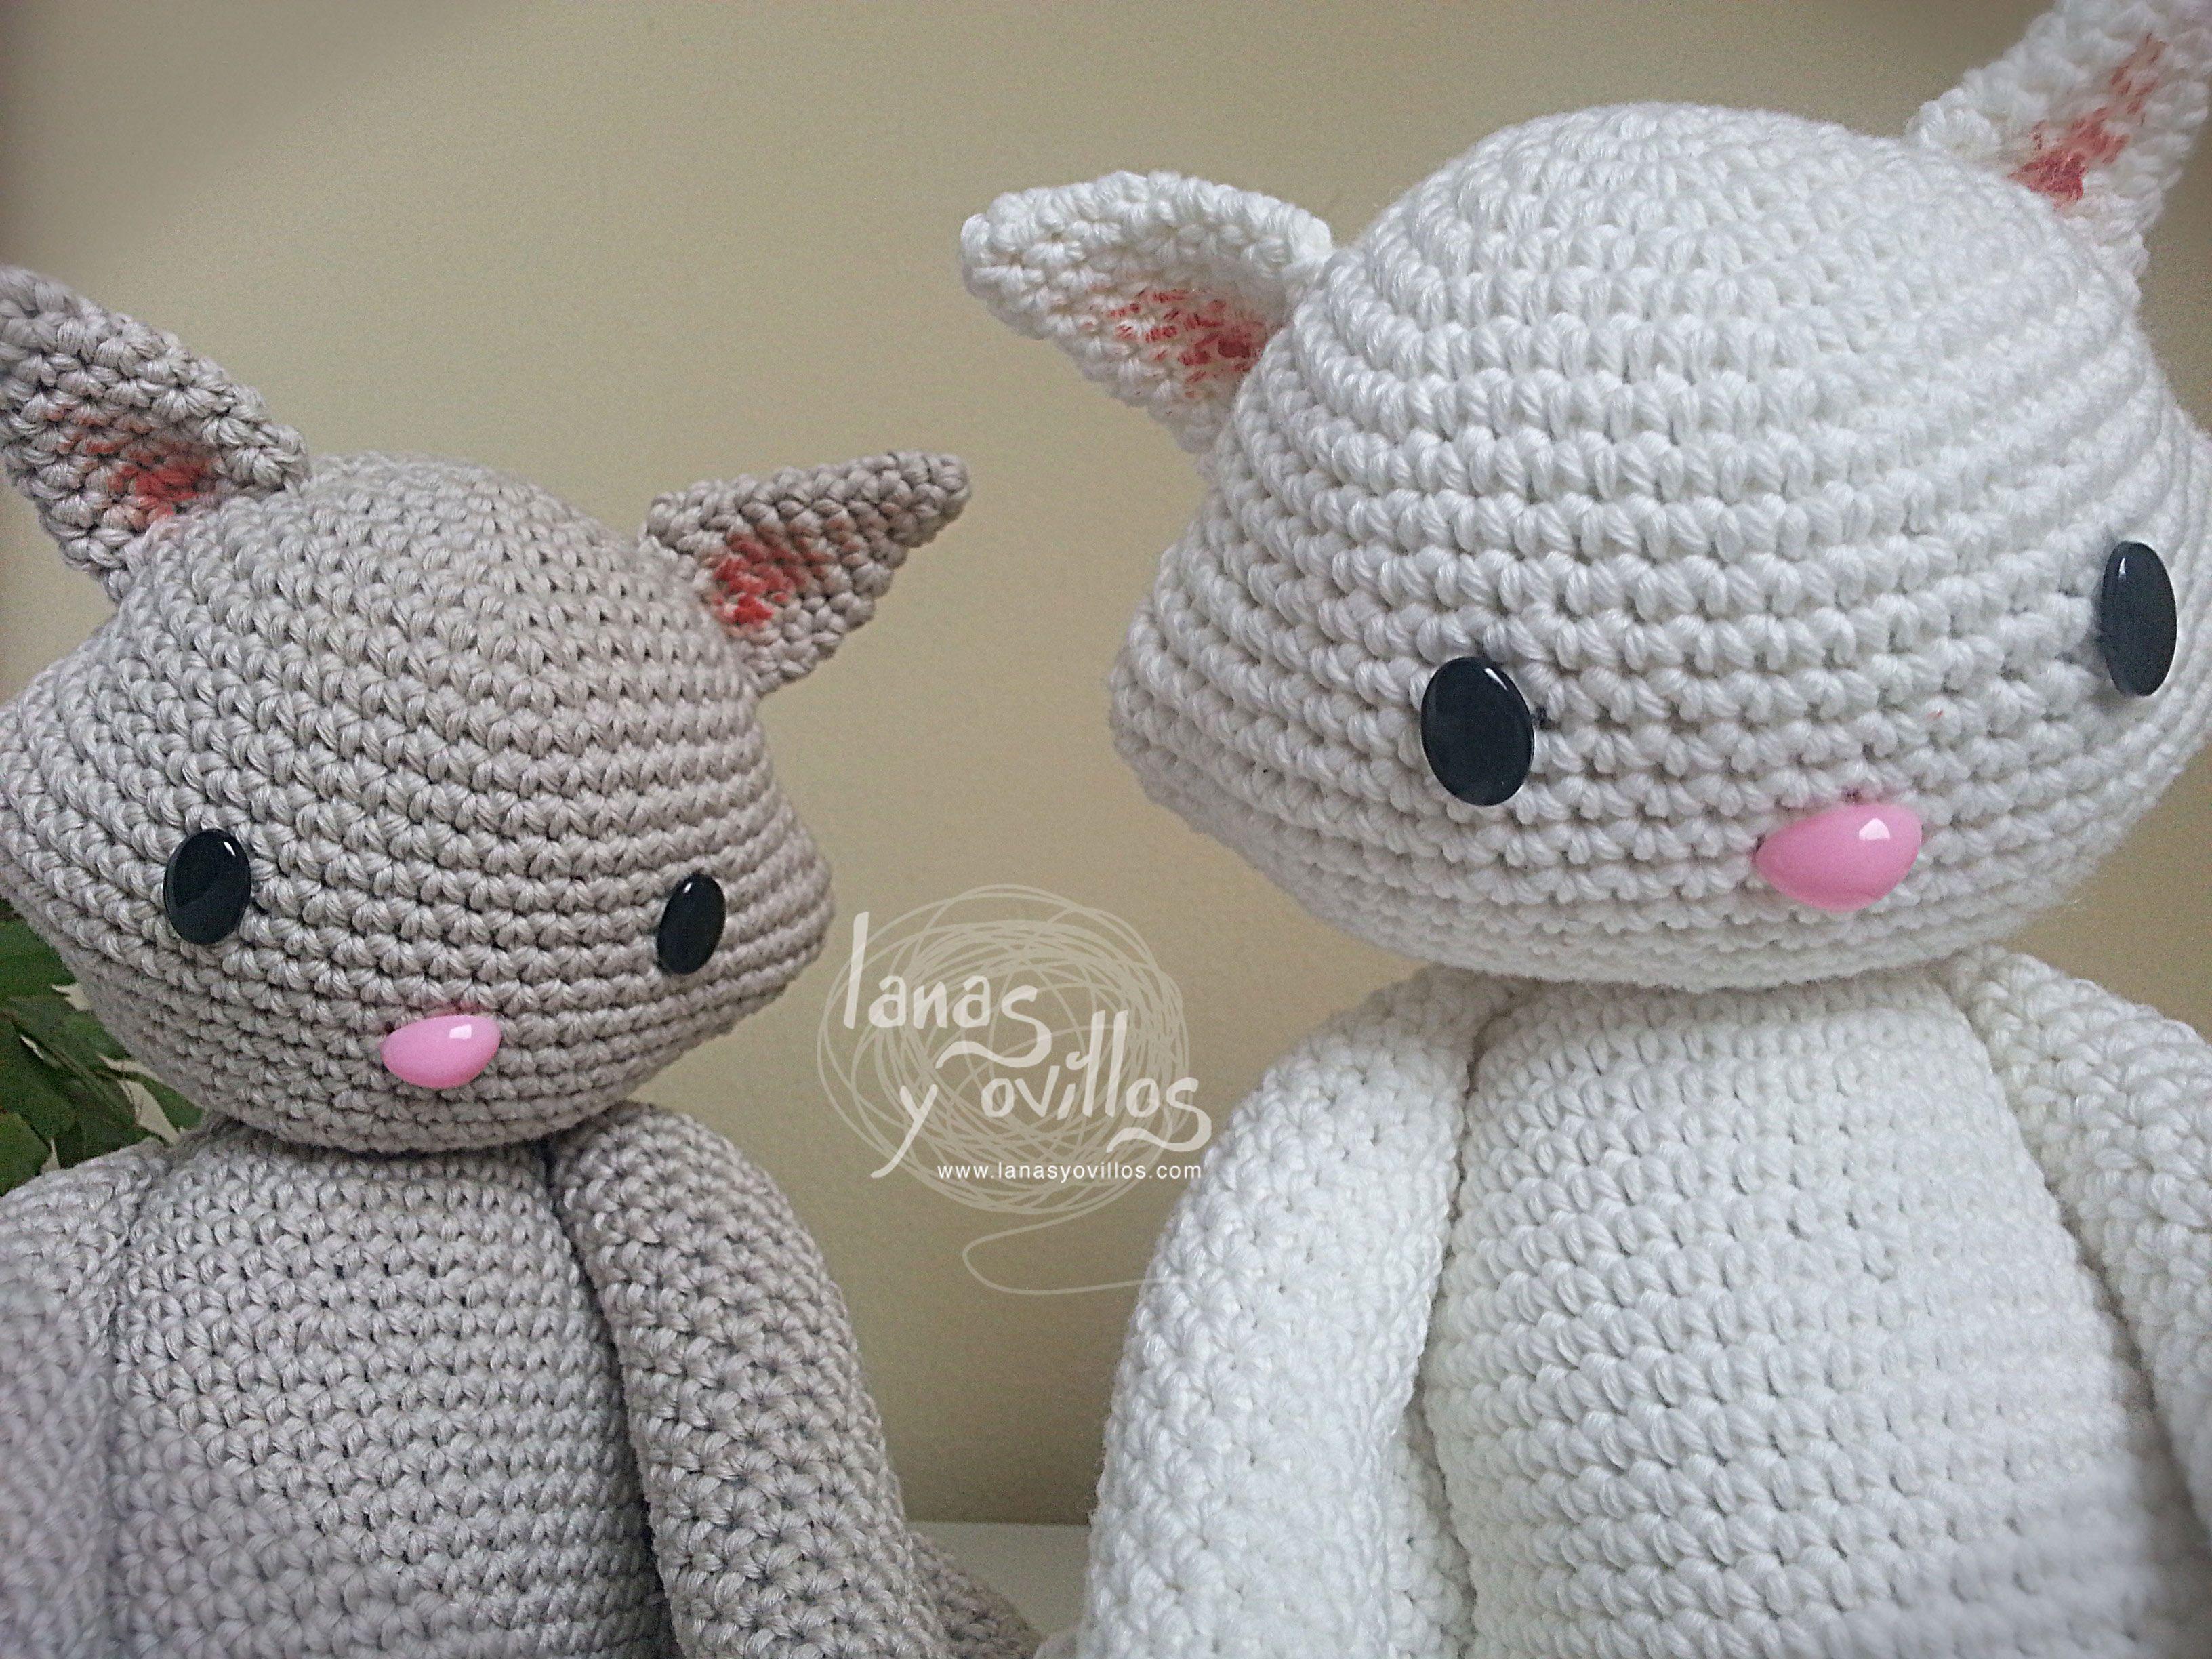 Amigurumis Gatos Patrones Gratis : Patron gato amigurumi gratis crochet cat free pattern our